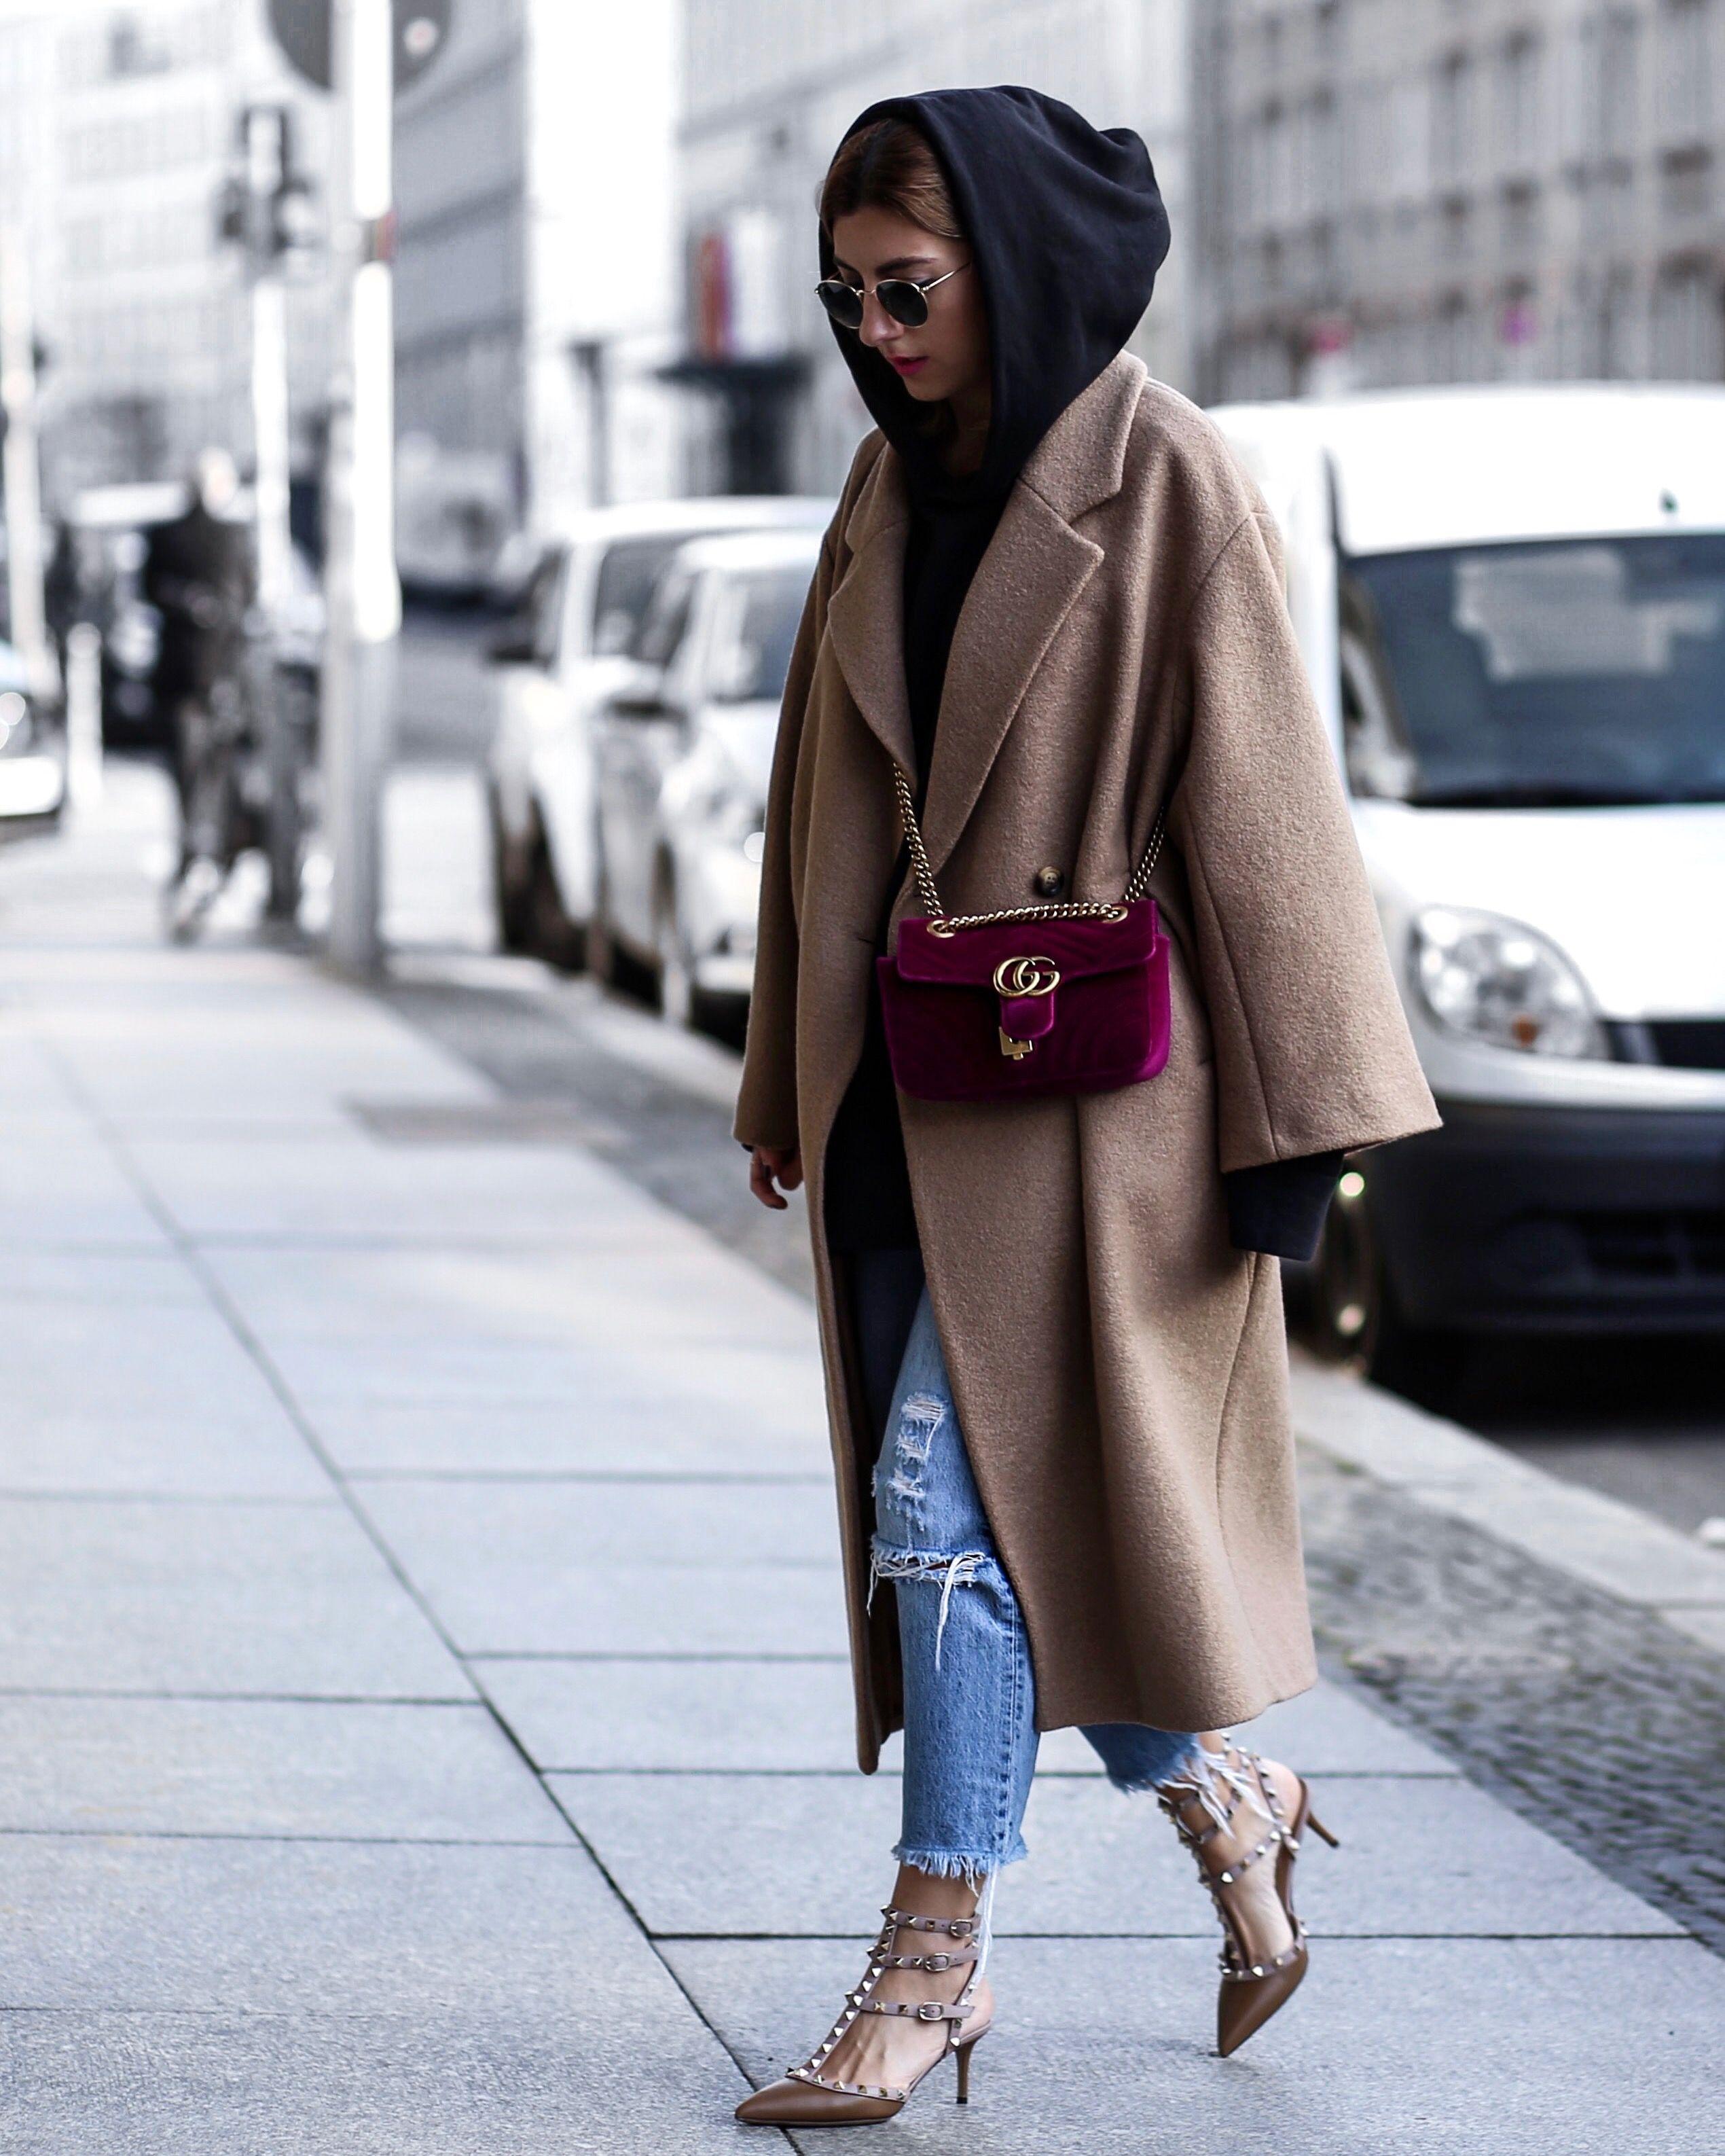 52aee7c43 Valentina rockstud heels! Gucci Marmont velvet bag - look up on www ...